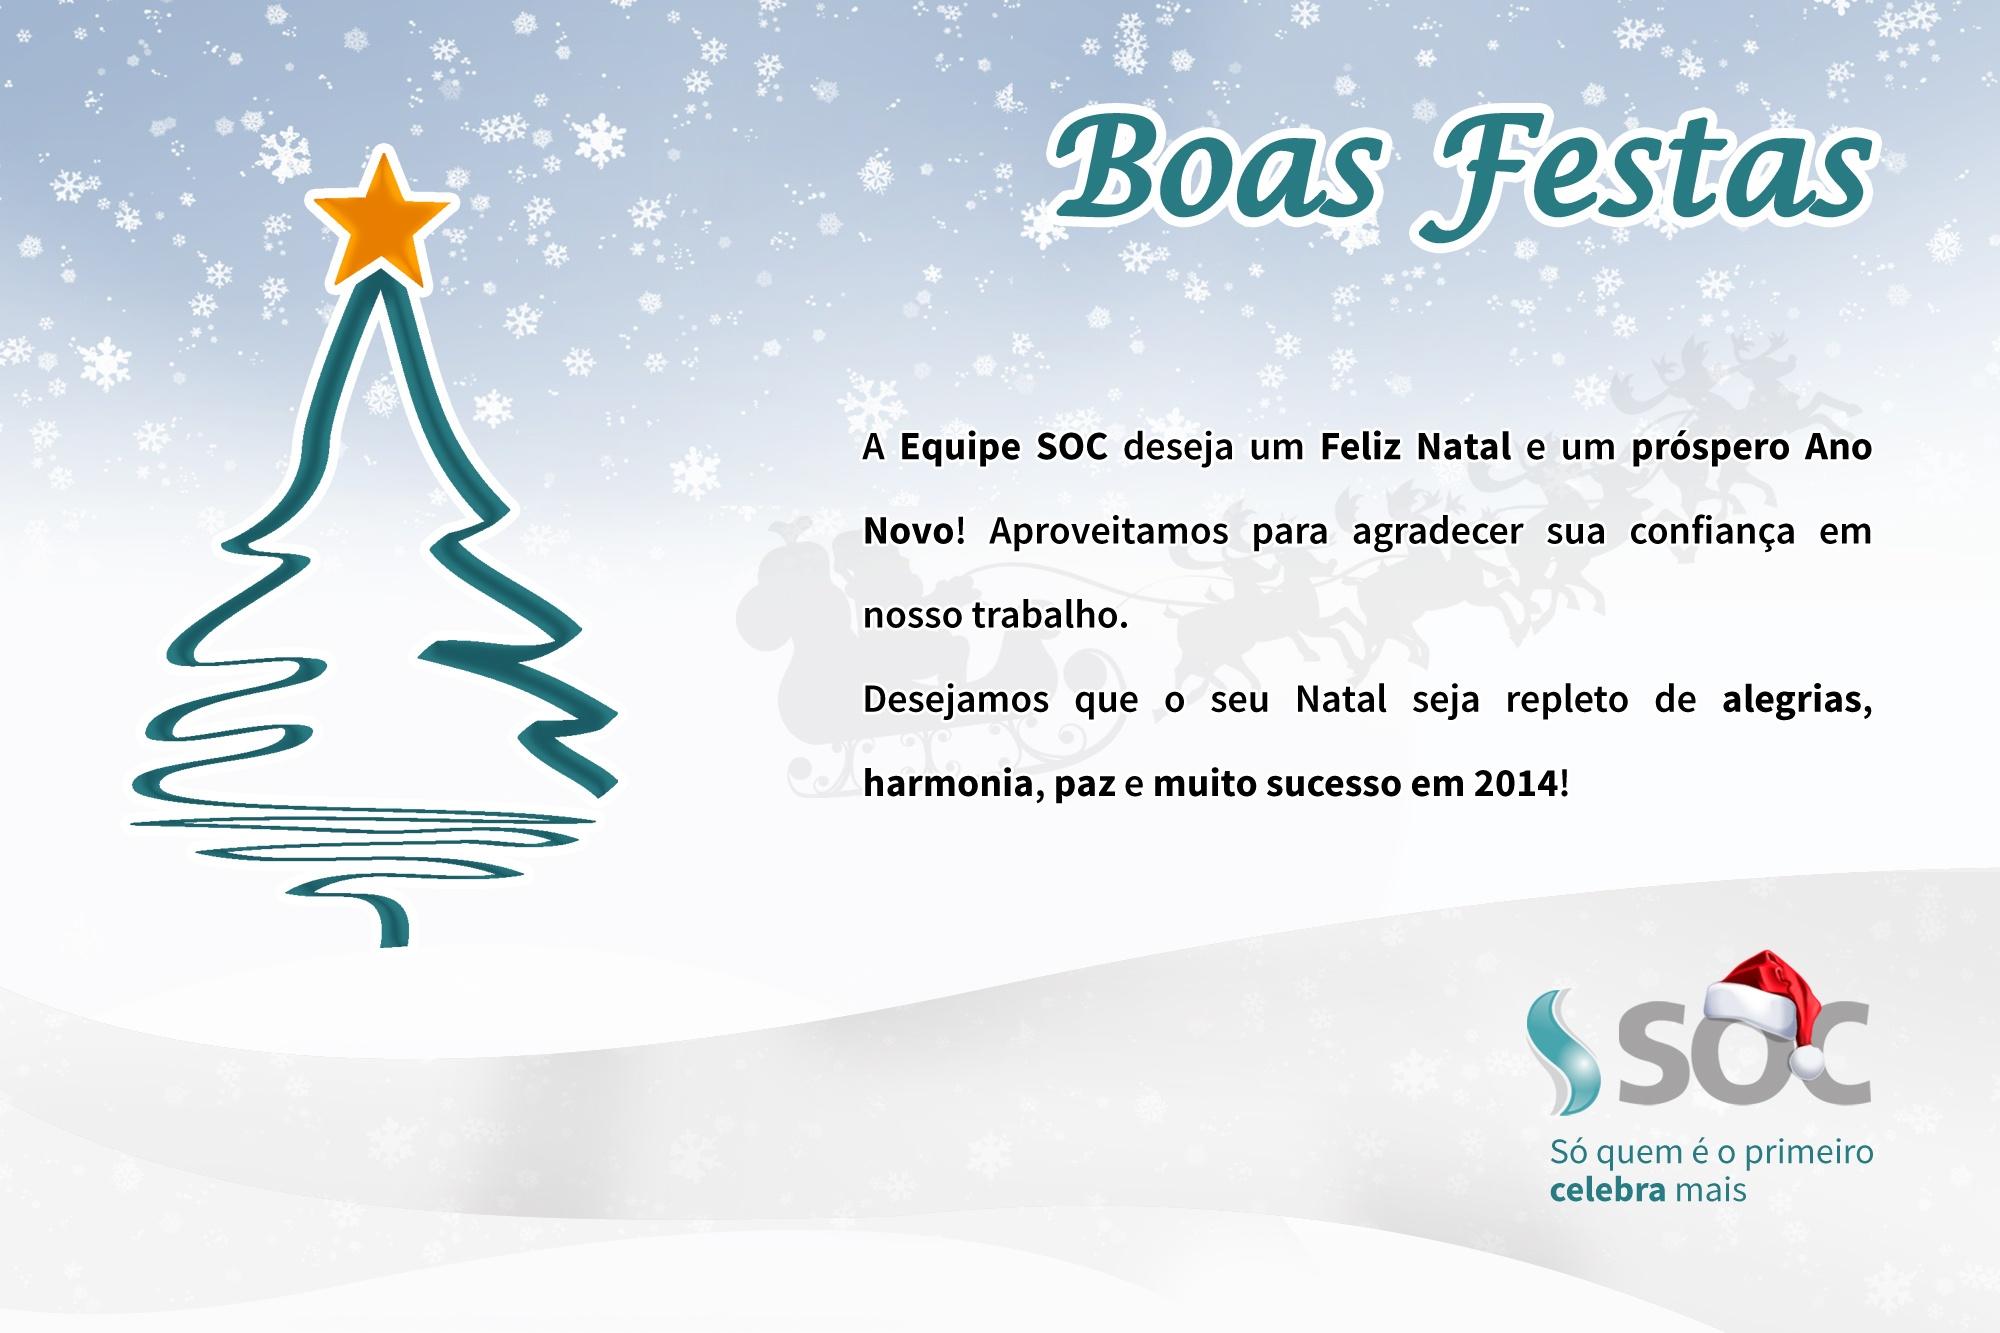 Frases De Boas Festas Para Clientes: Boas Festas & Feliz 2014!